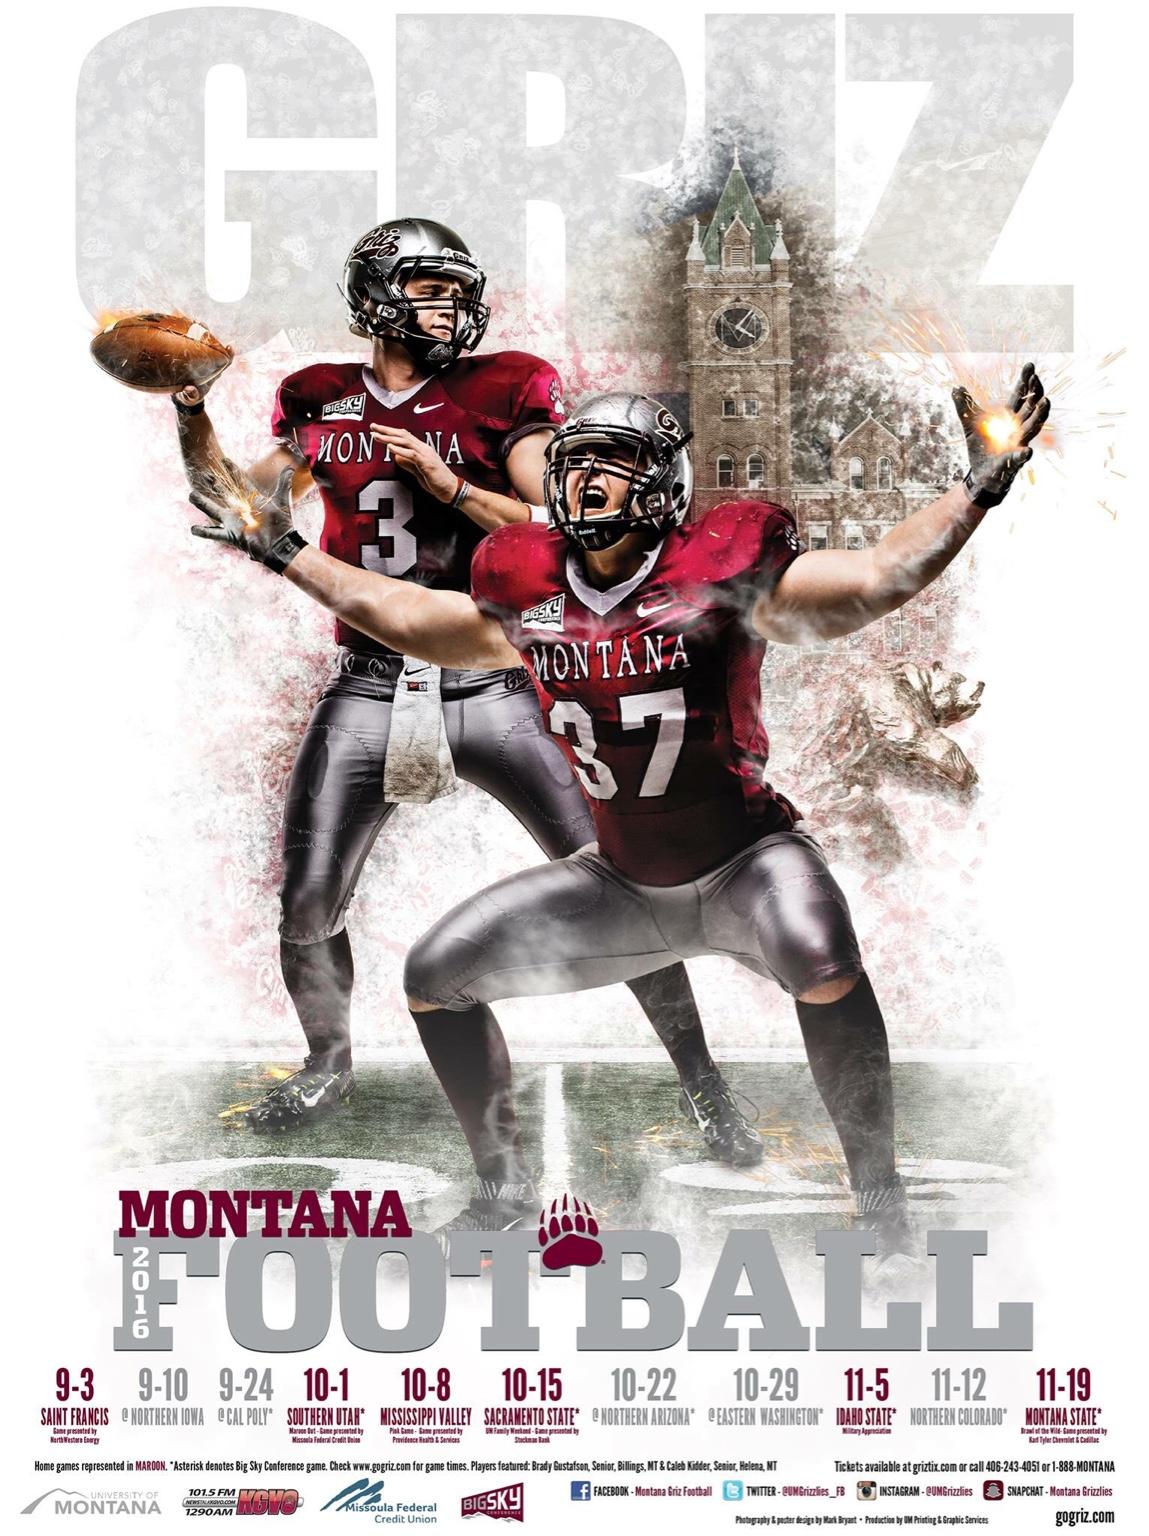 2016 Poster Montana Grizzlies Griz Athletics